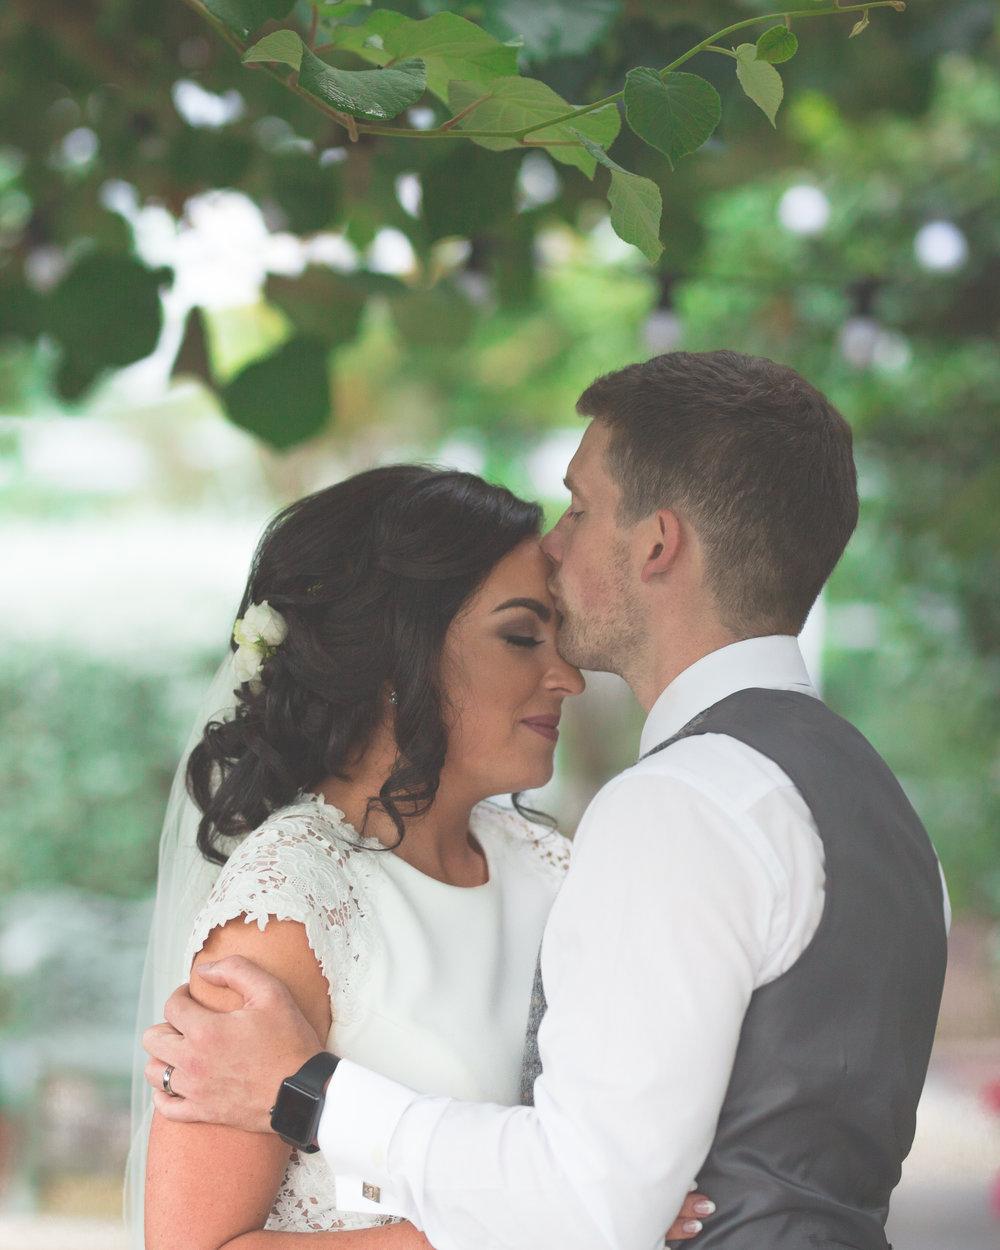 Brian McEwan Wedding Photography | Carol-Anne & Sean | The Portraits-73.jpg